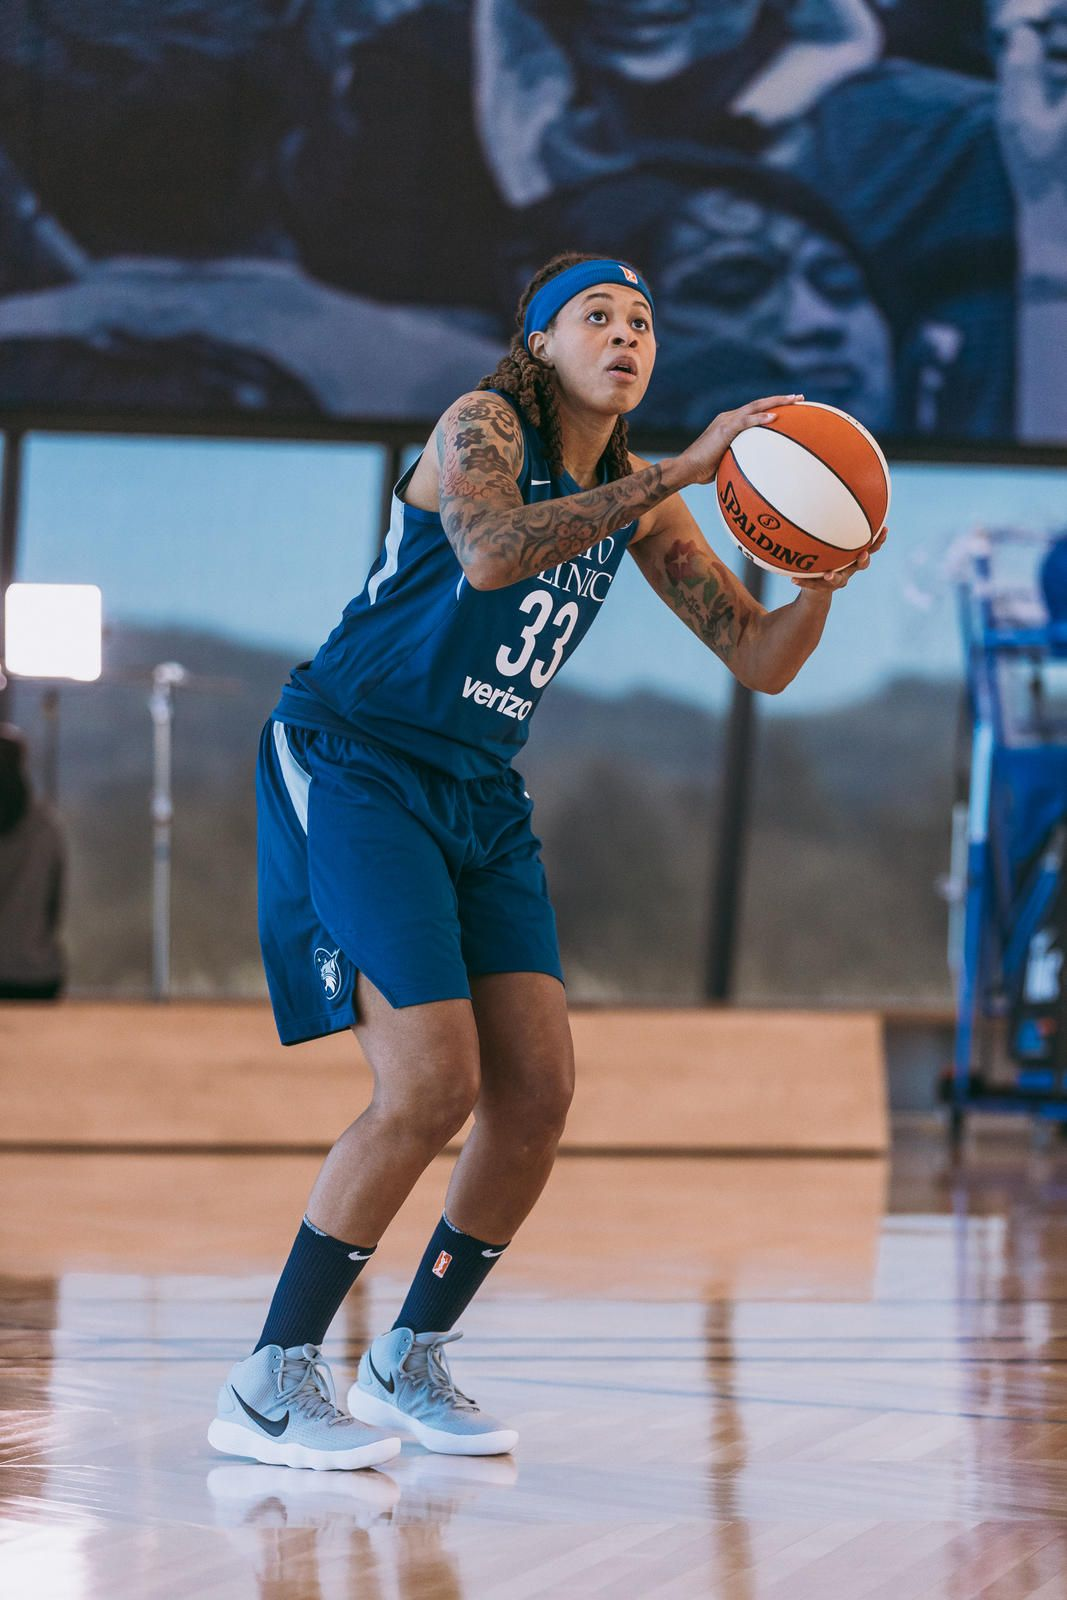 Basketball Uniform Design-New WNBA Nike